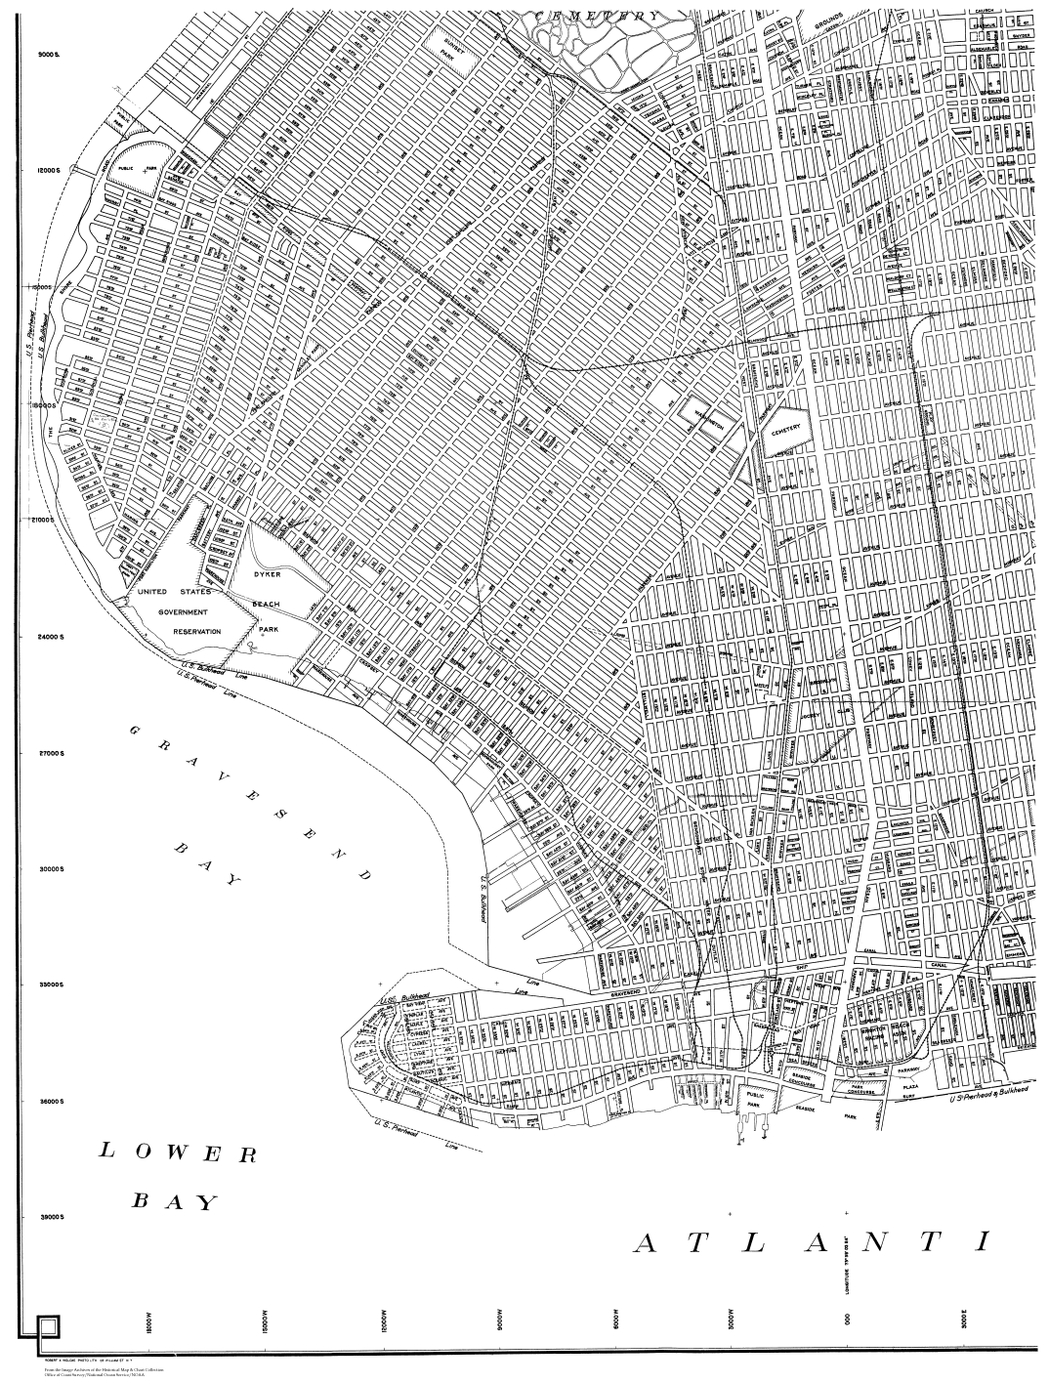 [map] [brooklyn] [new york] LB